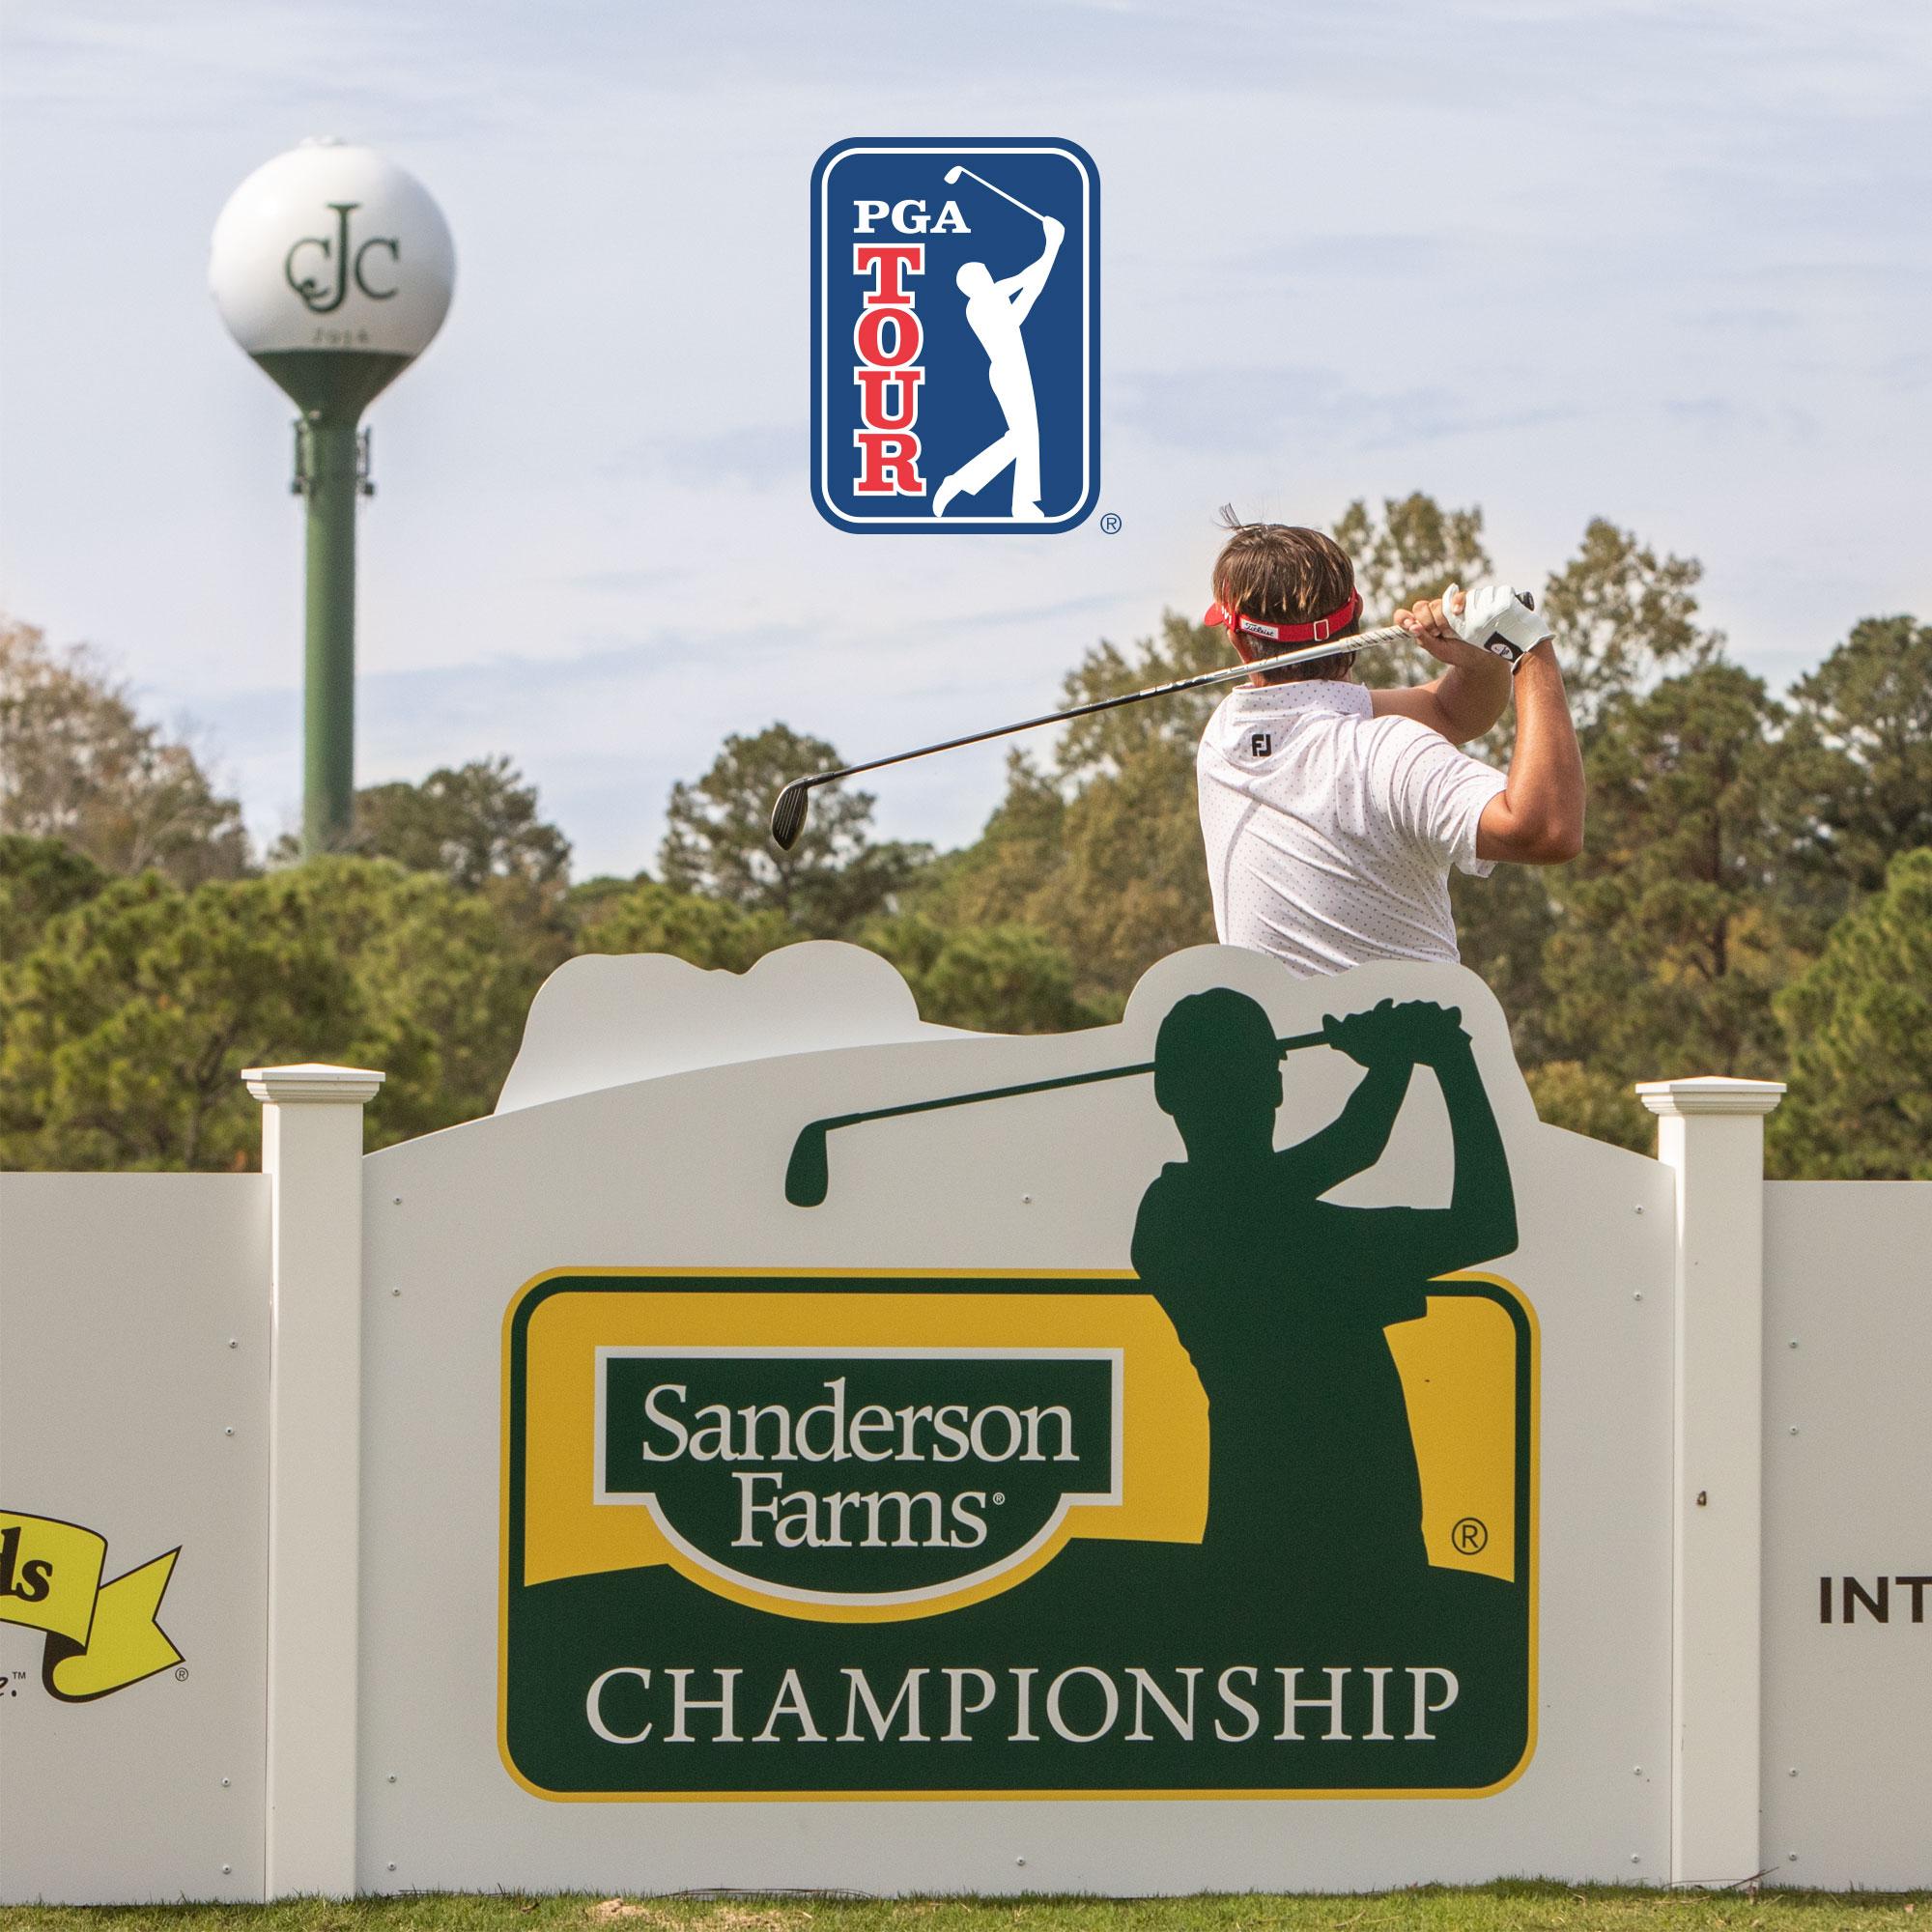 Photography, Videography: Sanderson Farms Championship PGA Tour